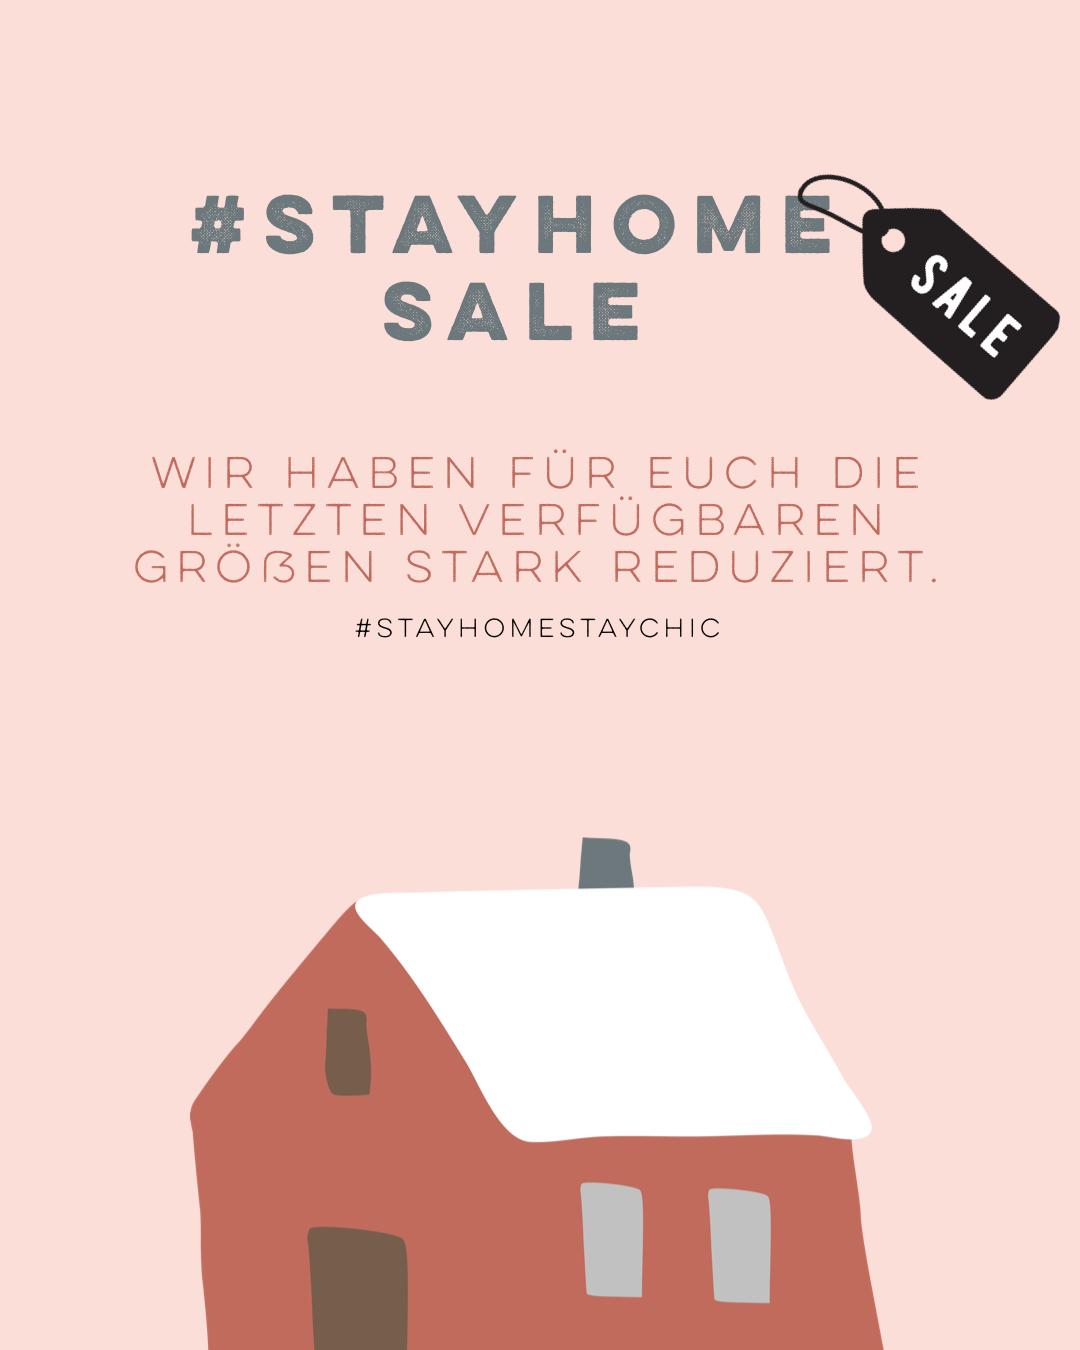 #STAYATHOME SALE